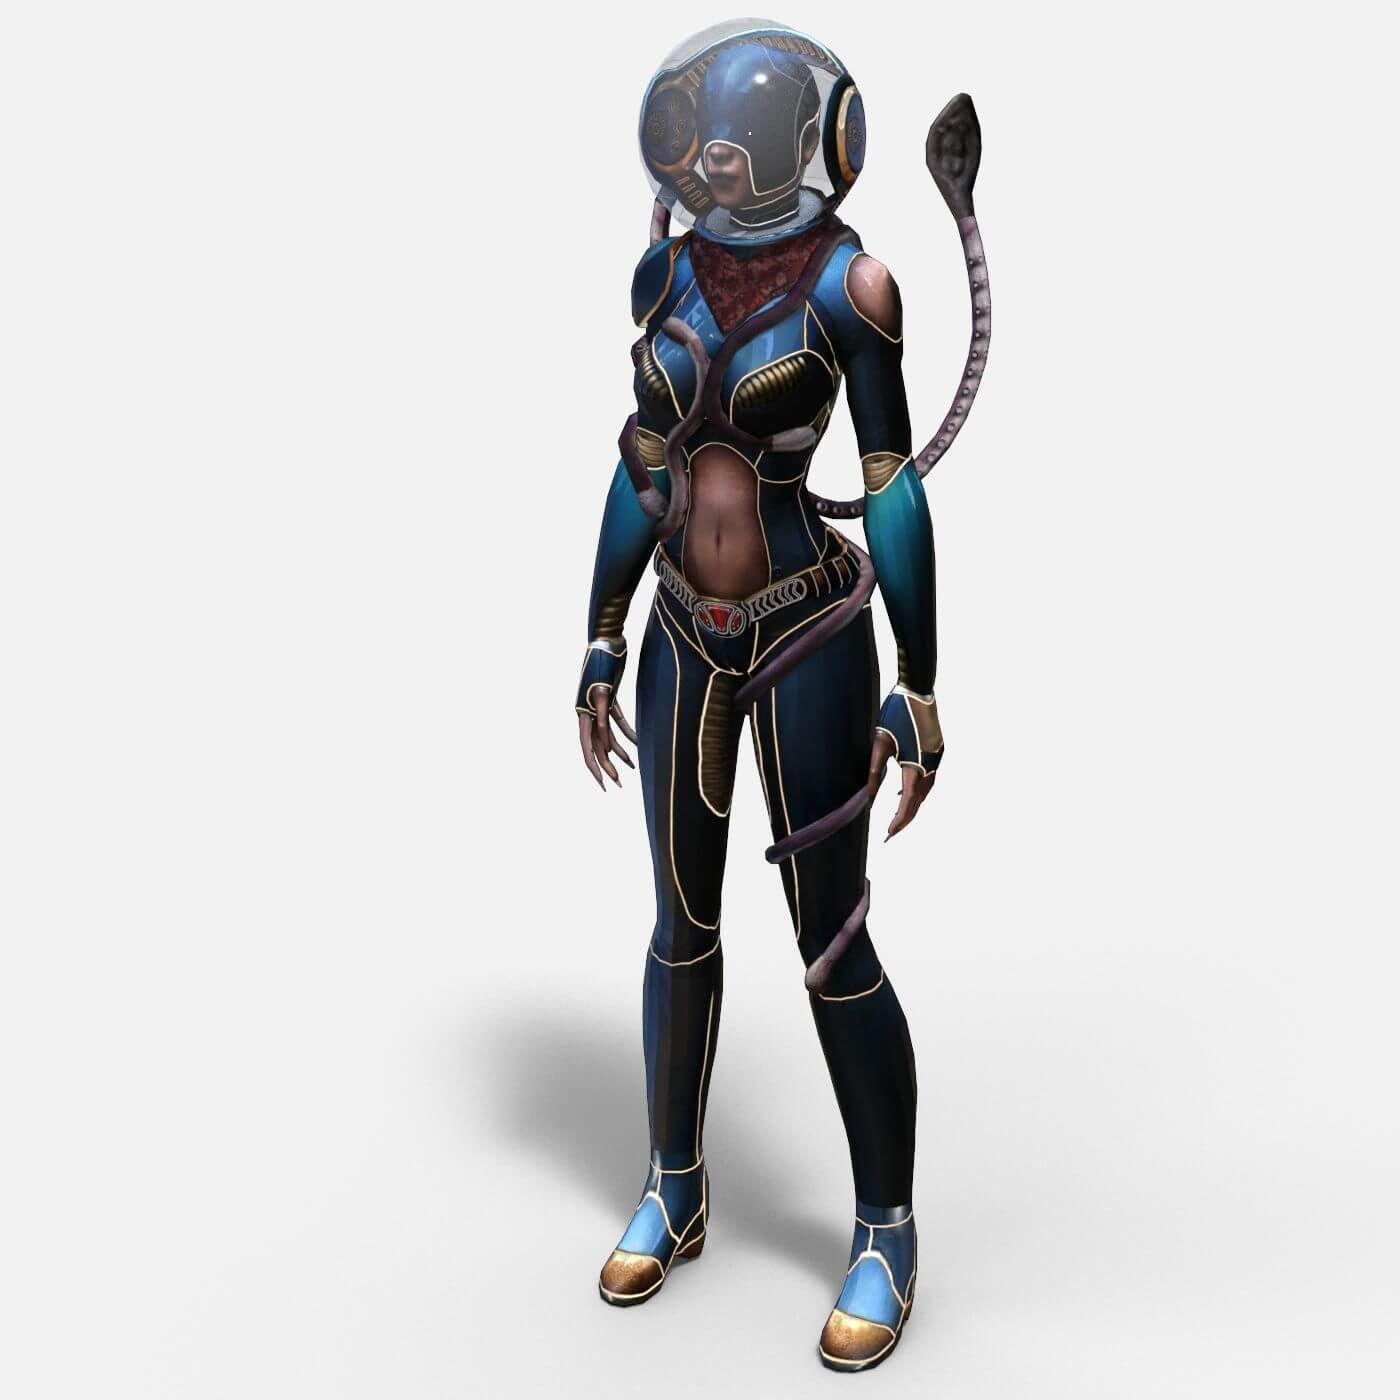 sci fi, Women, Warrior, Woman, Girl, Girls, Futuristic